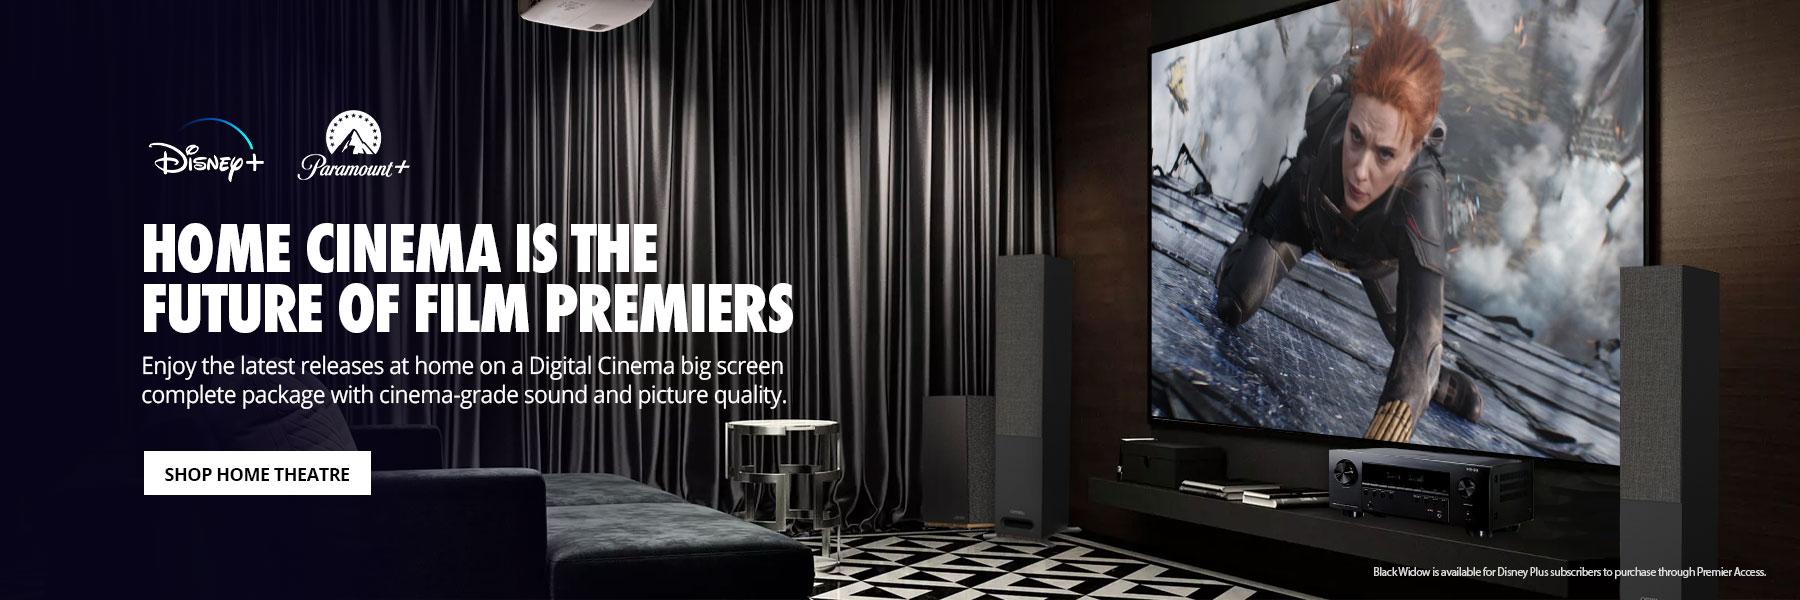 Home cinema at Digital Cinema